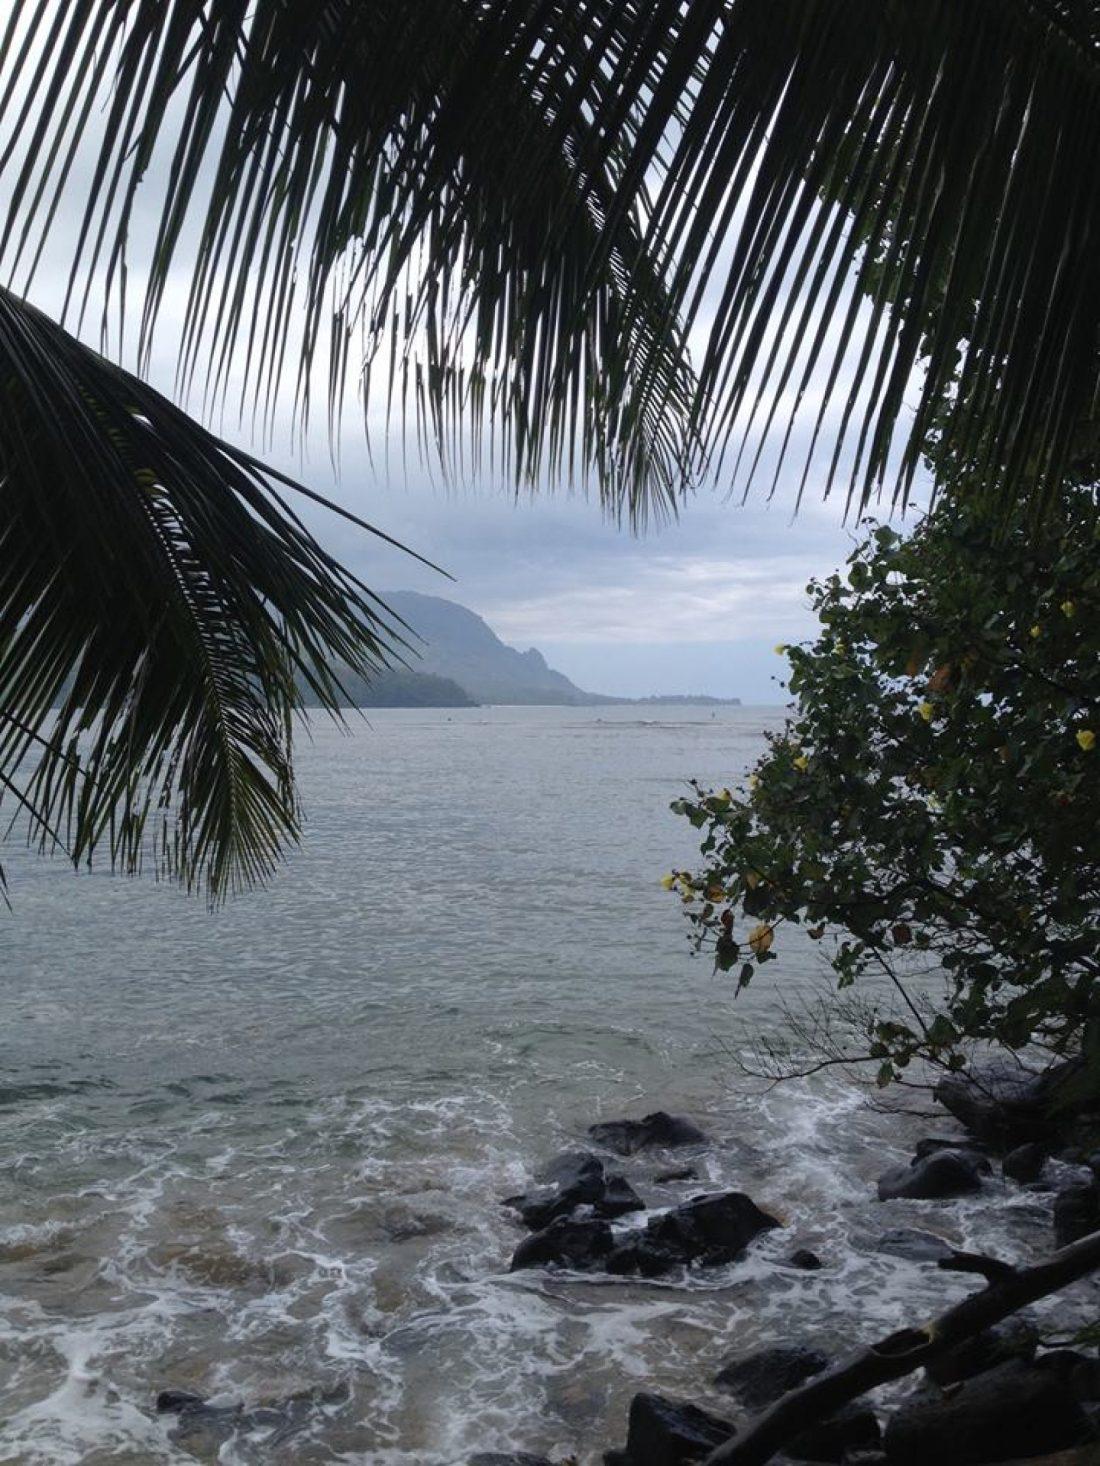 cropped-beach-at-st-regis.jpg